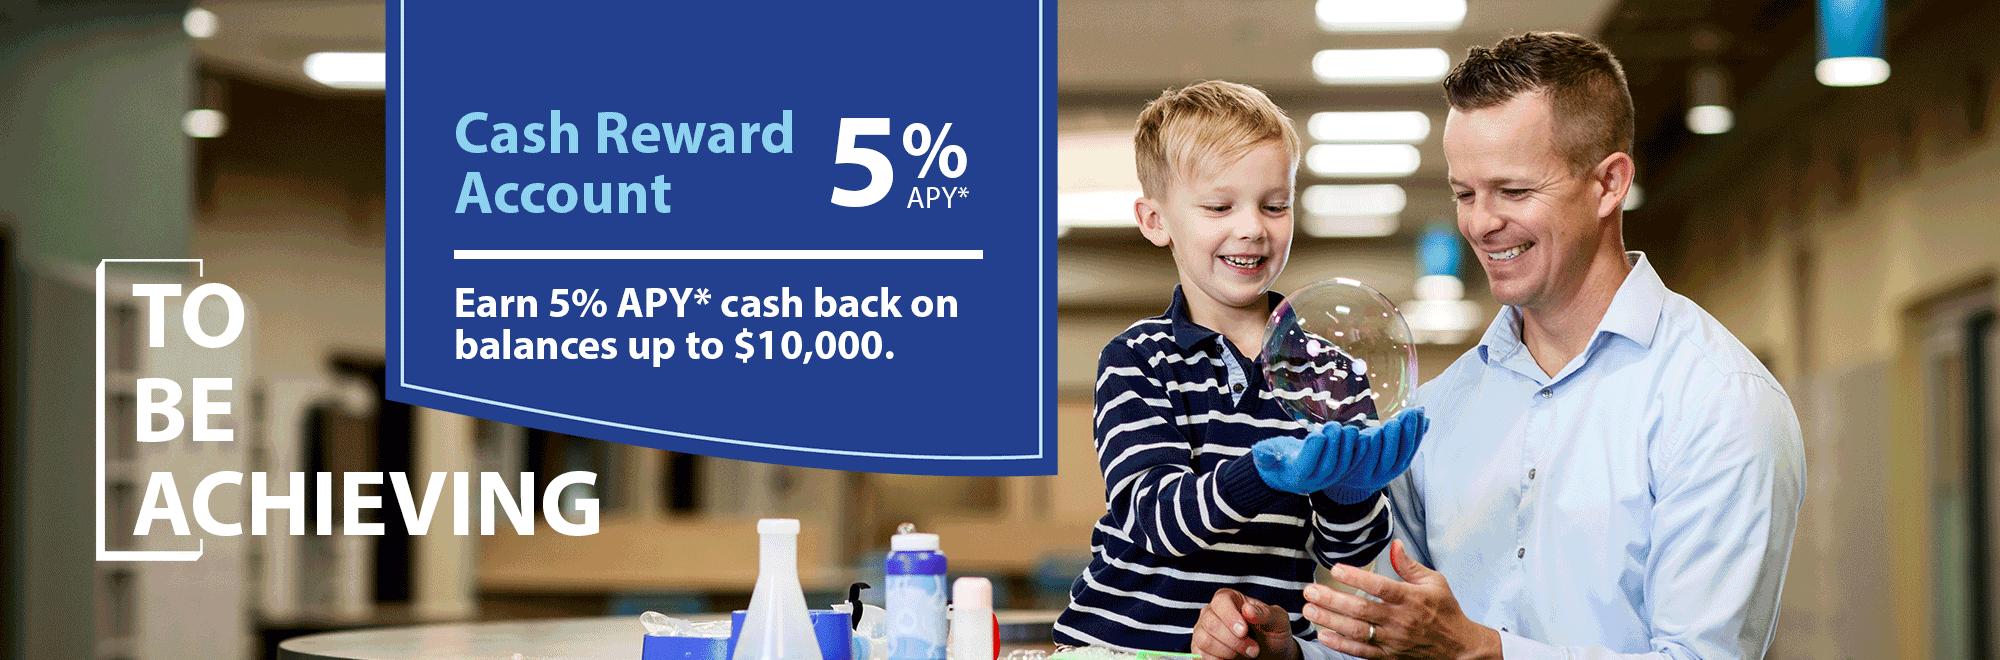 Cash Reward Account. Earn 5% APY* on balances up to $10,000.